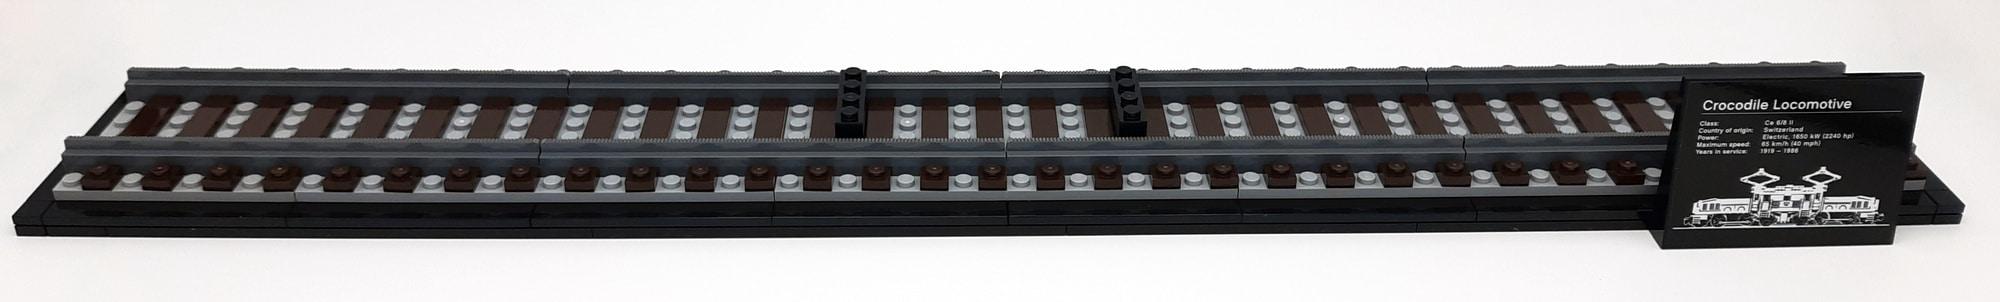 LEGO 10277 Krokodil Lokomotive - Bauabschnitt 1